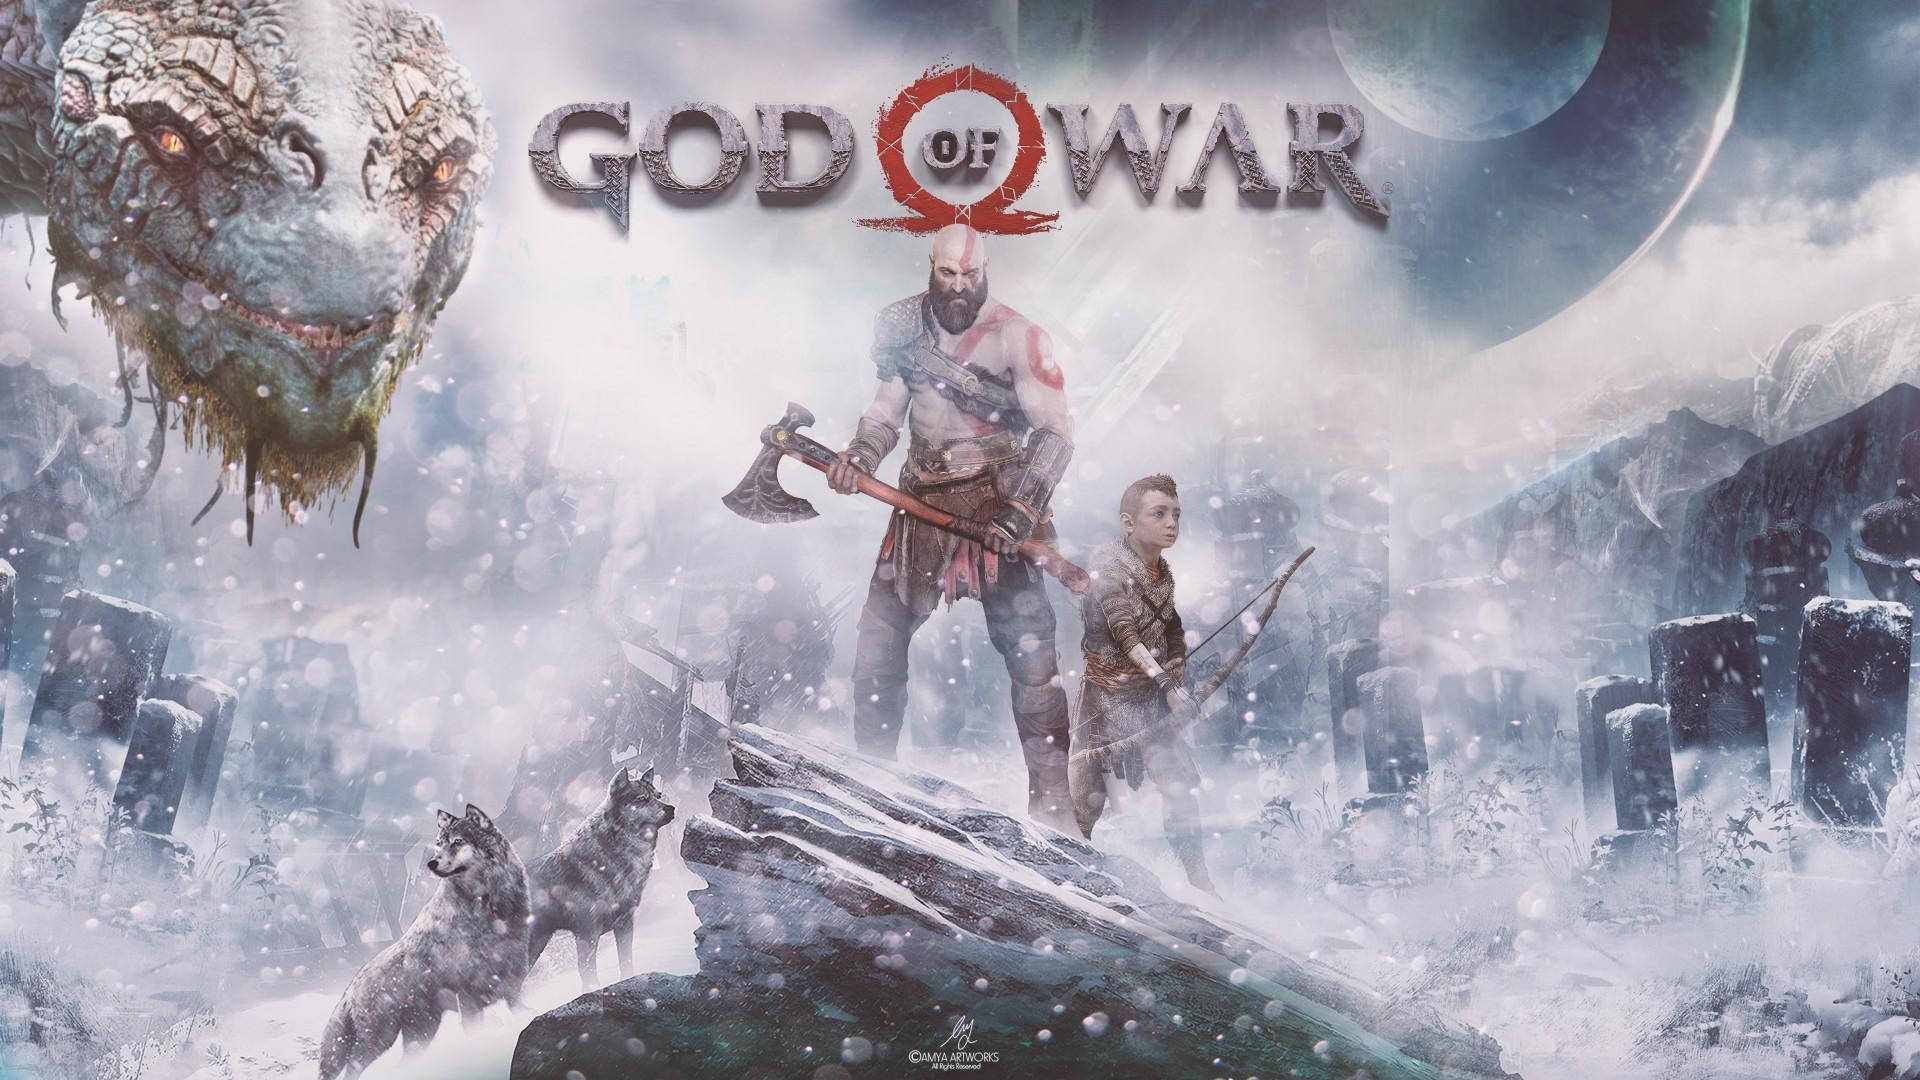 God Of War Ps4 4k Hd Wallpaper Iphone 7 Plus Iphone 8 Plus Hd